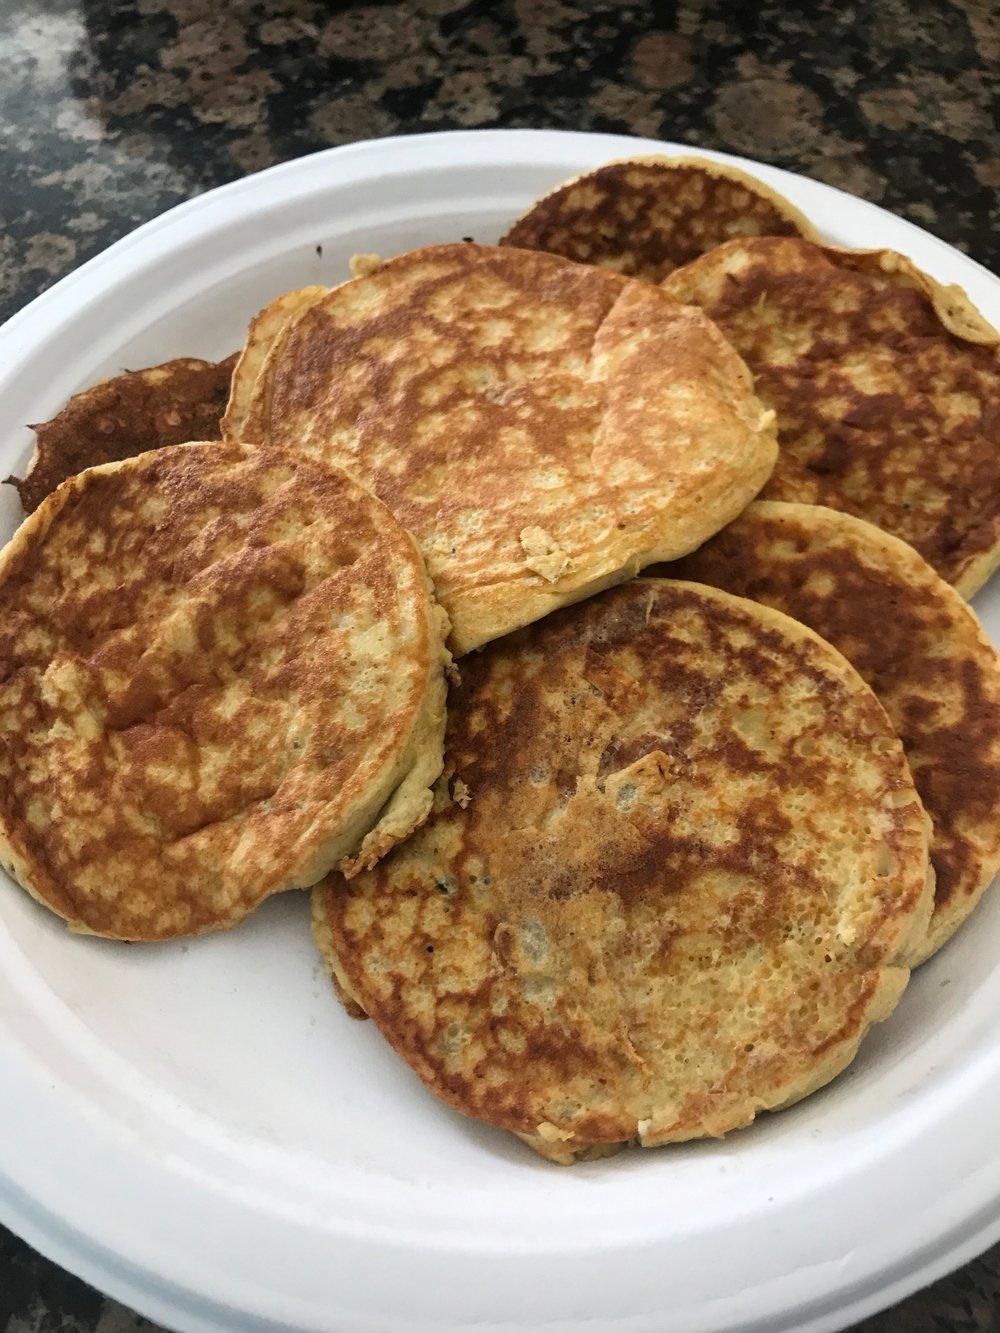 BANANA PROTEIN PANCAKES, RECIPE AT: http://willowbirdbaking.com/2015/01/20/four-ingredient-protein-pancakes-16-simple-healthy-meals/